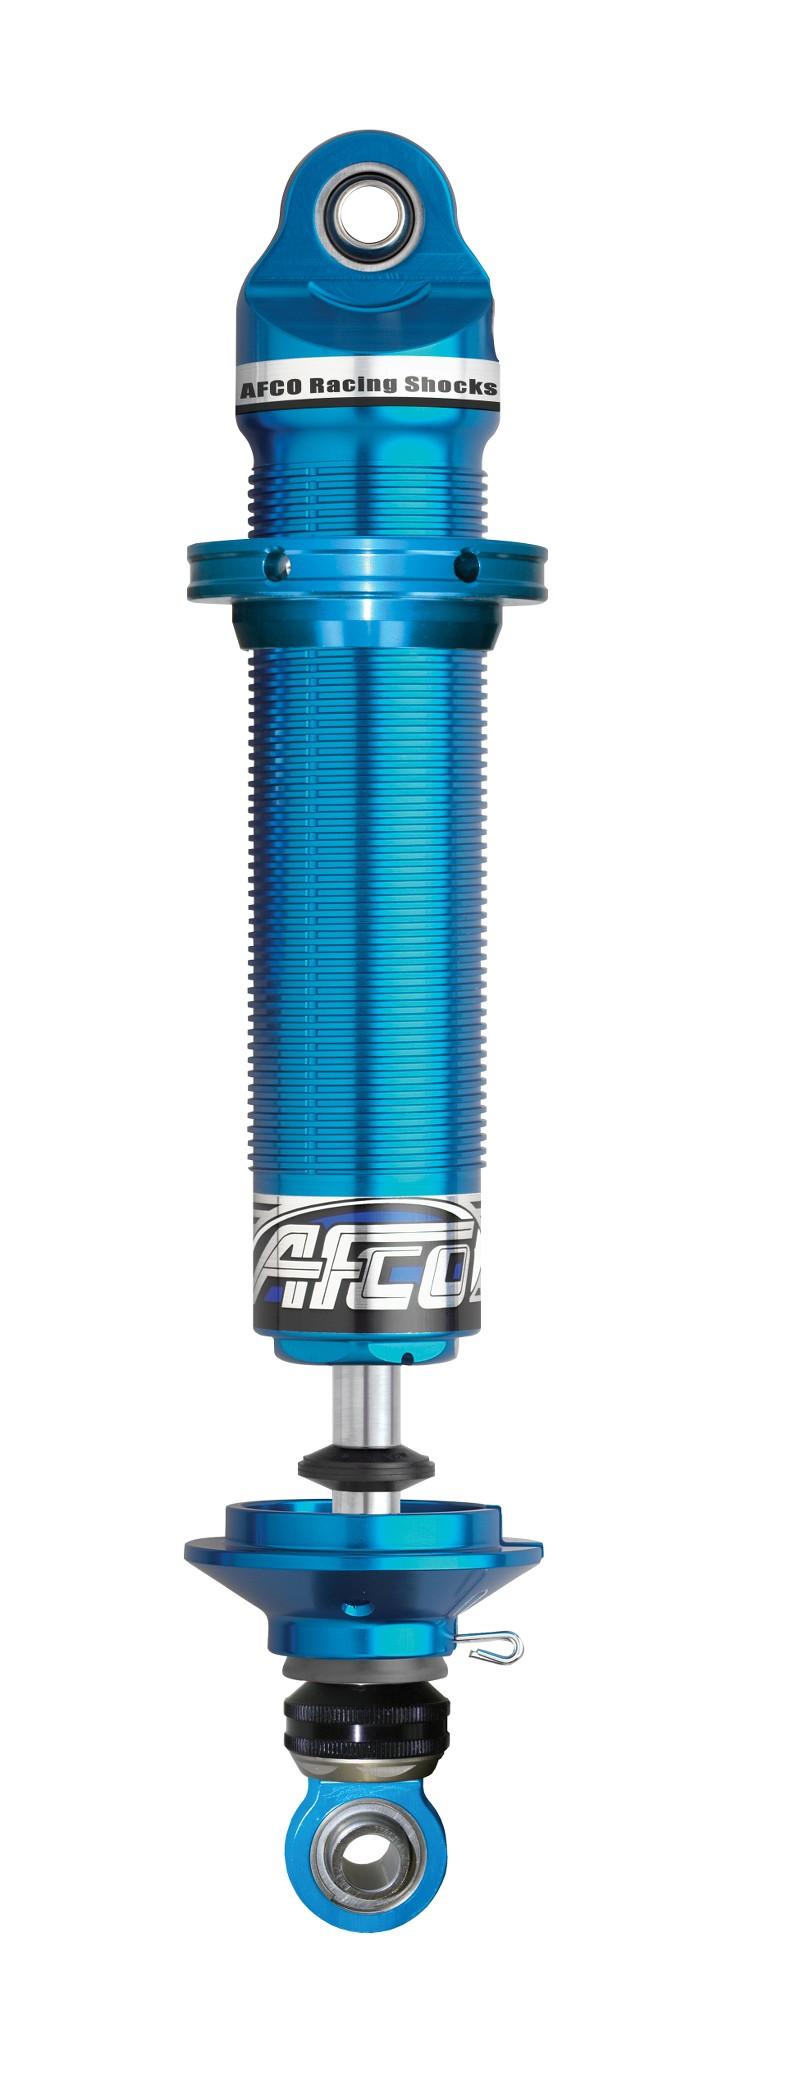 Aluminum Shock Twin Tube 36 Series Rebound Adjustable 7 Inch Stroke Comp 5/Reb 3-6